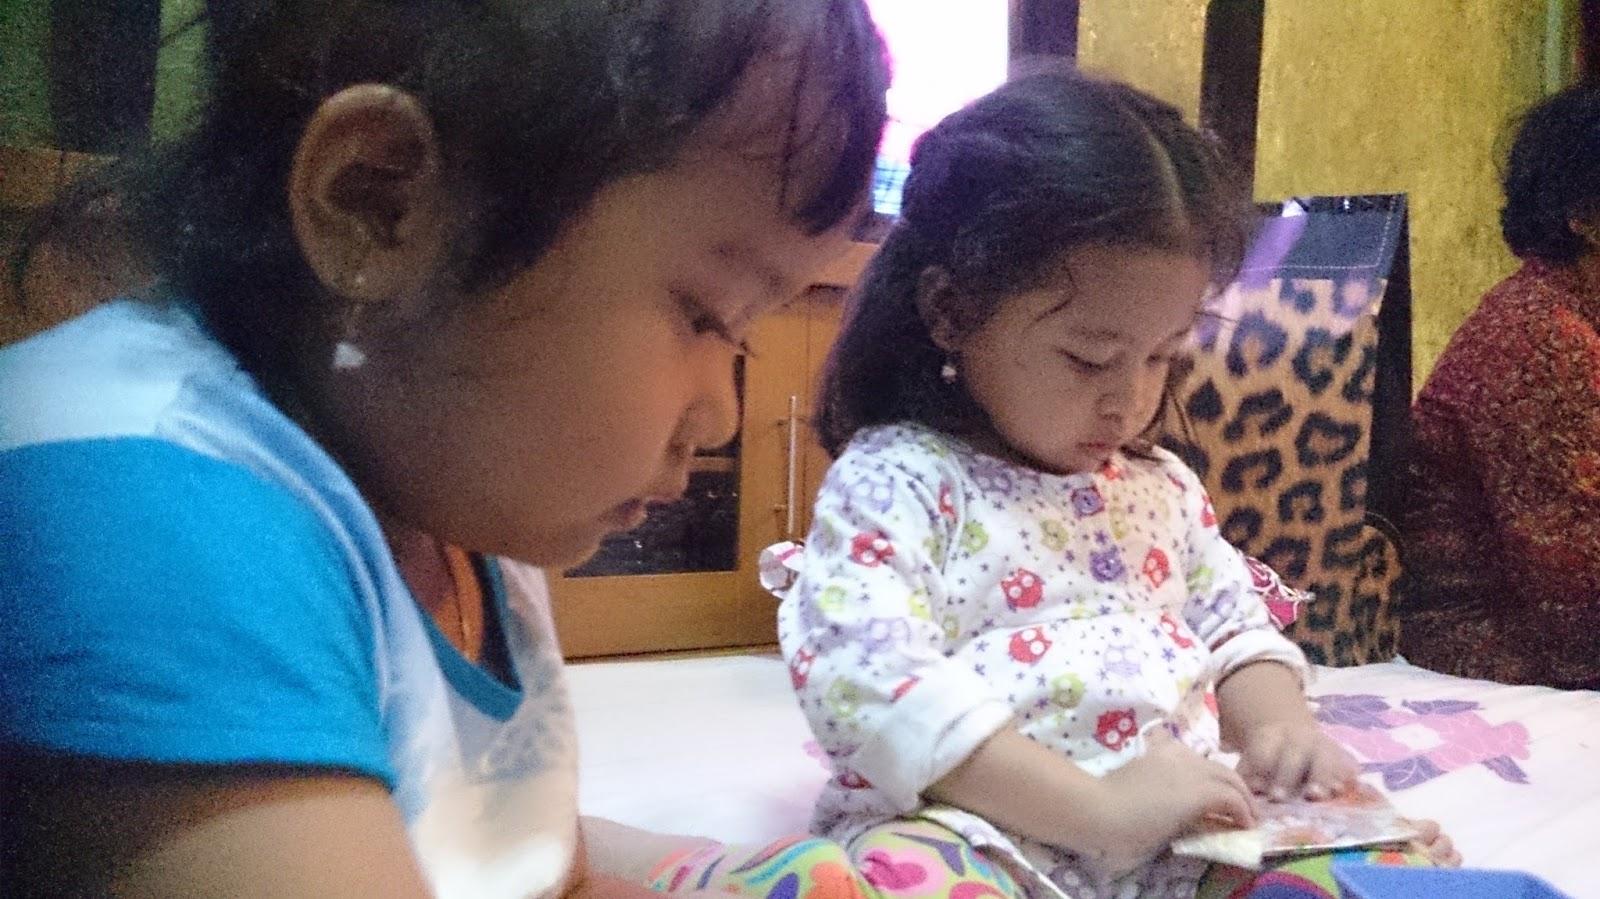 Vallen Dan Khansa Lagi Serius Main Keponakan Tante Nadya Yang Cantik Cantik Dan Menggemaskan Walaupun Sama Sama Cantik Mereka Beda Banget